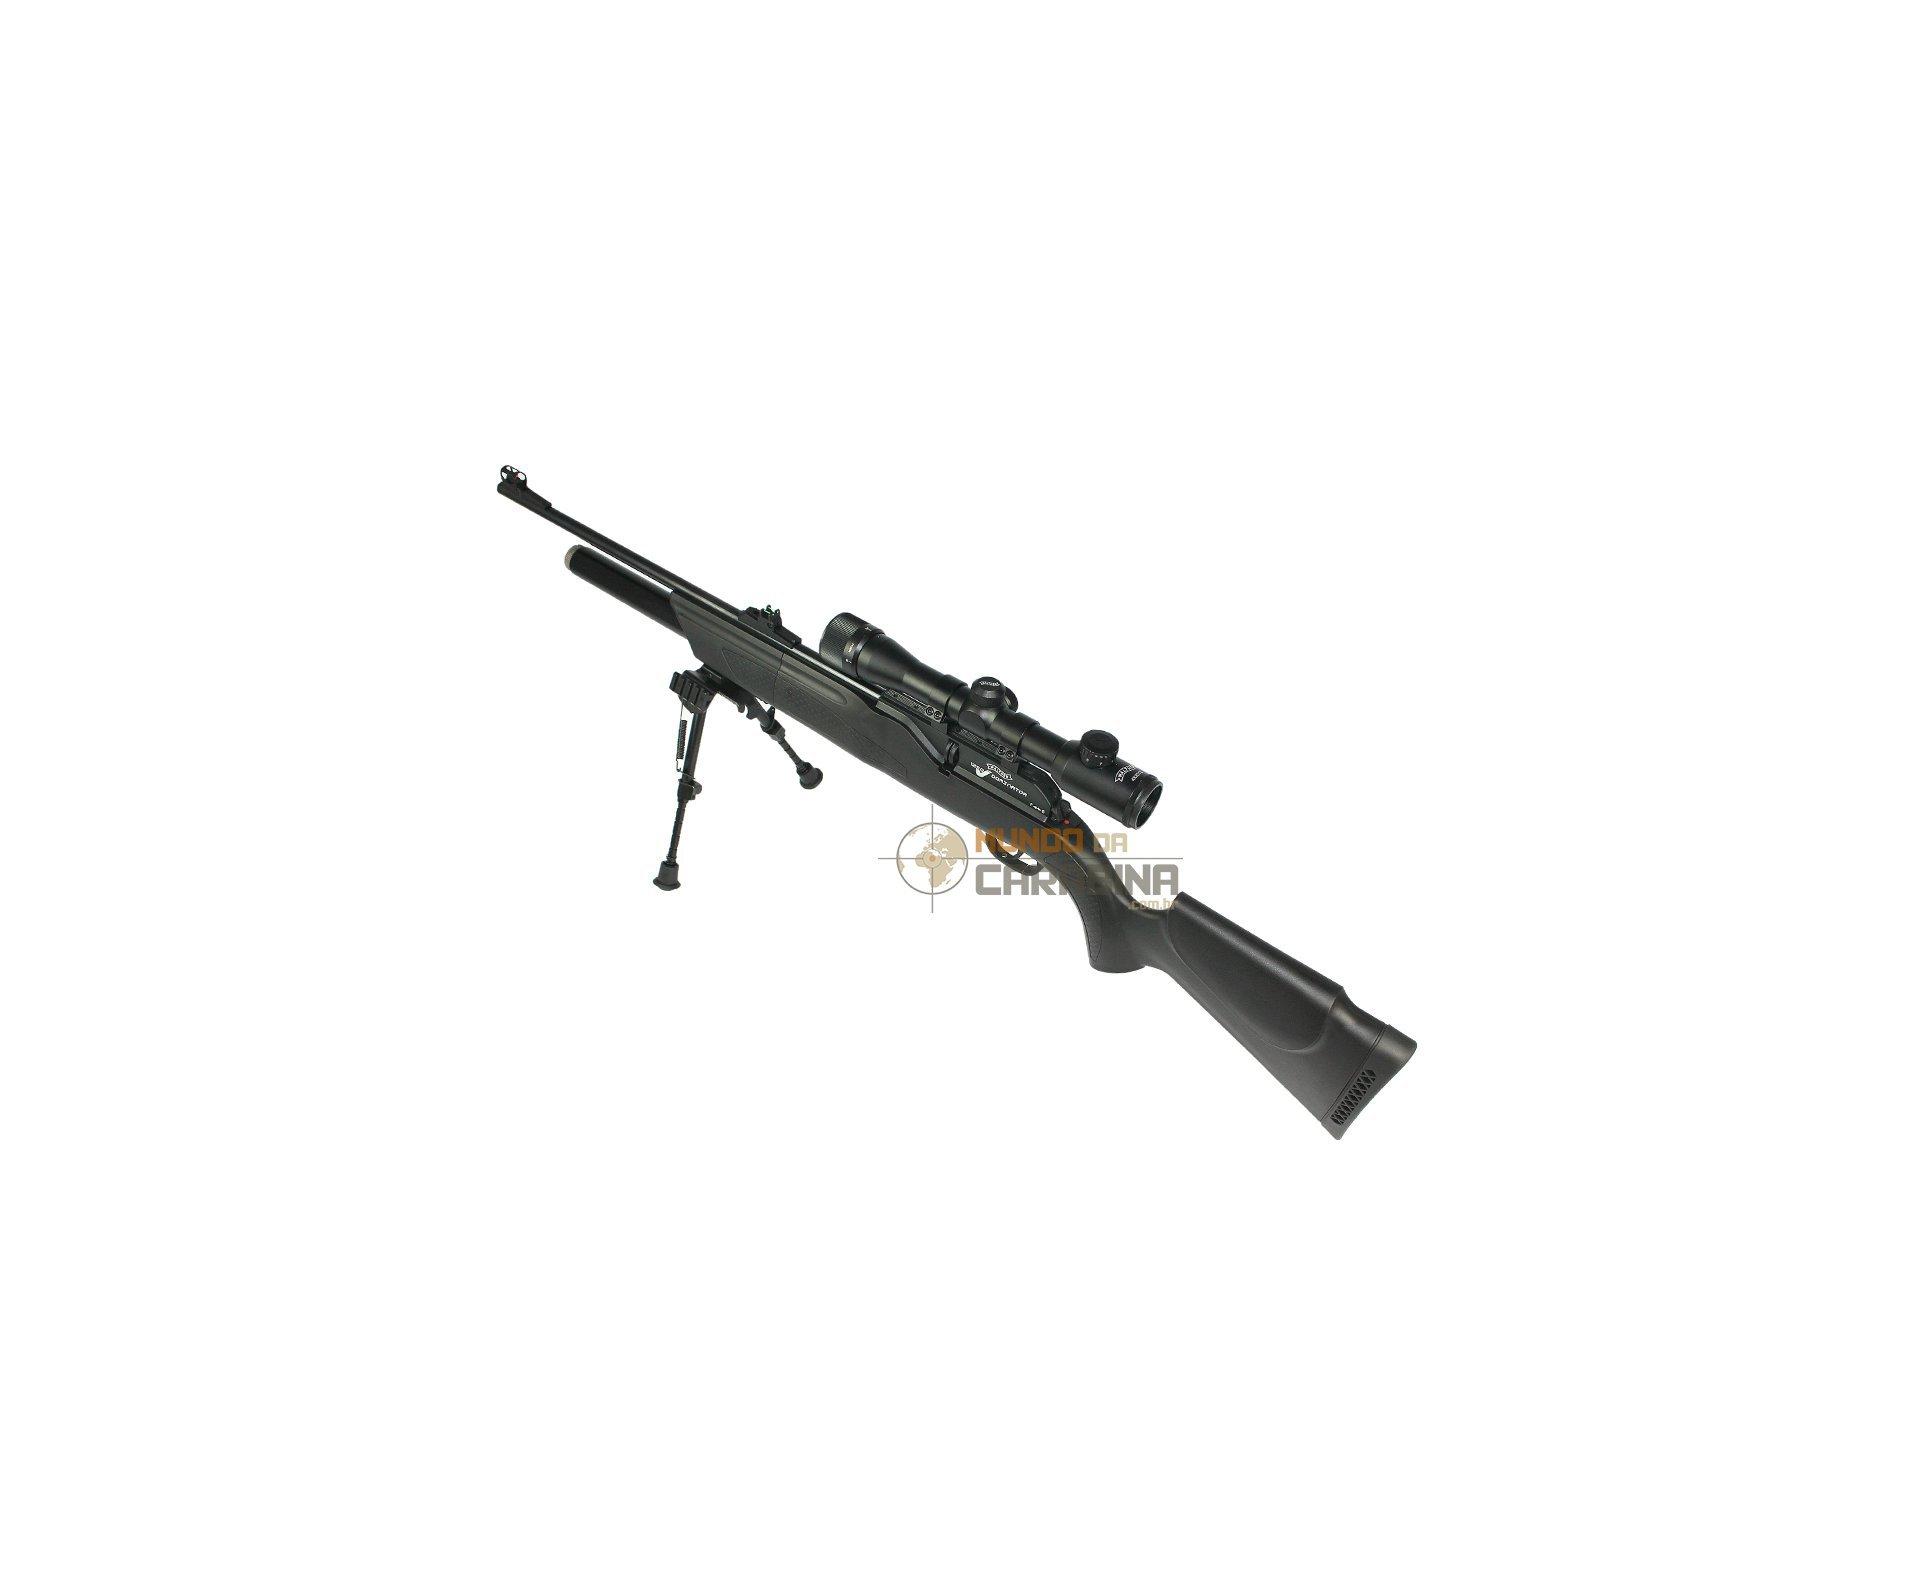 Carabina Pcp Dominator Ft 1250 Set Cal 5.5mm + Luneta 4x32ci + Bipe - Walther